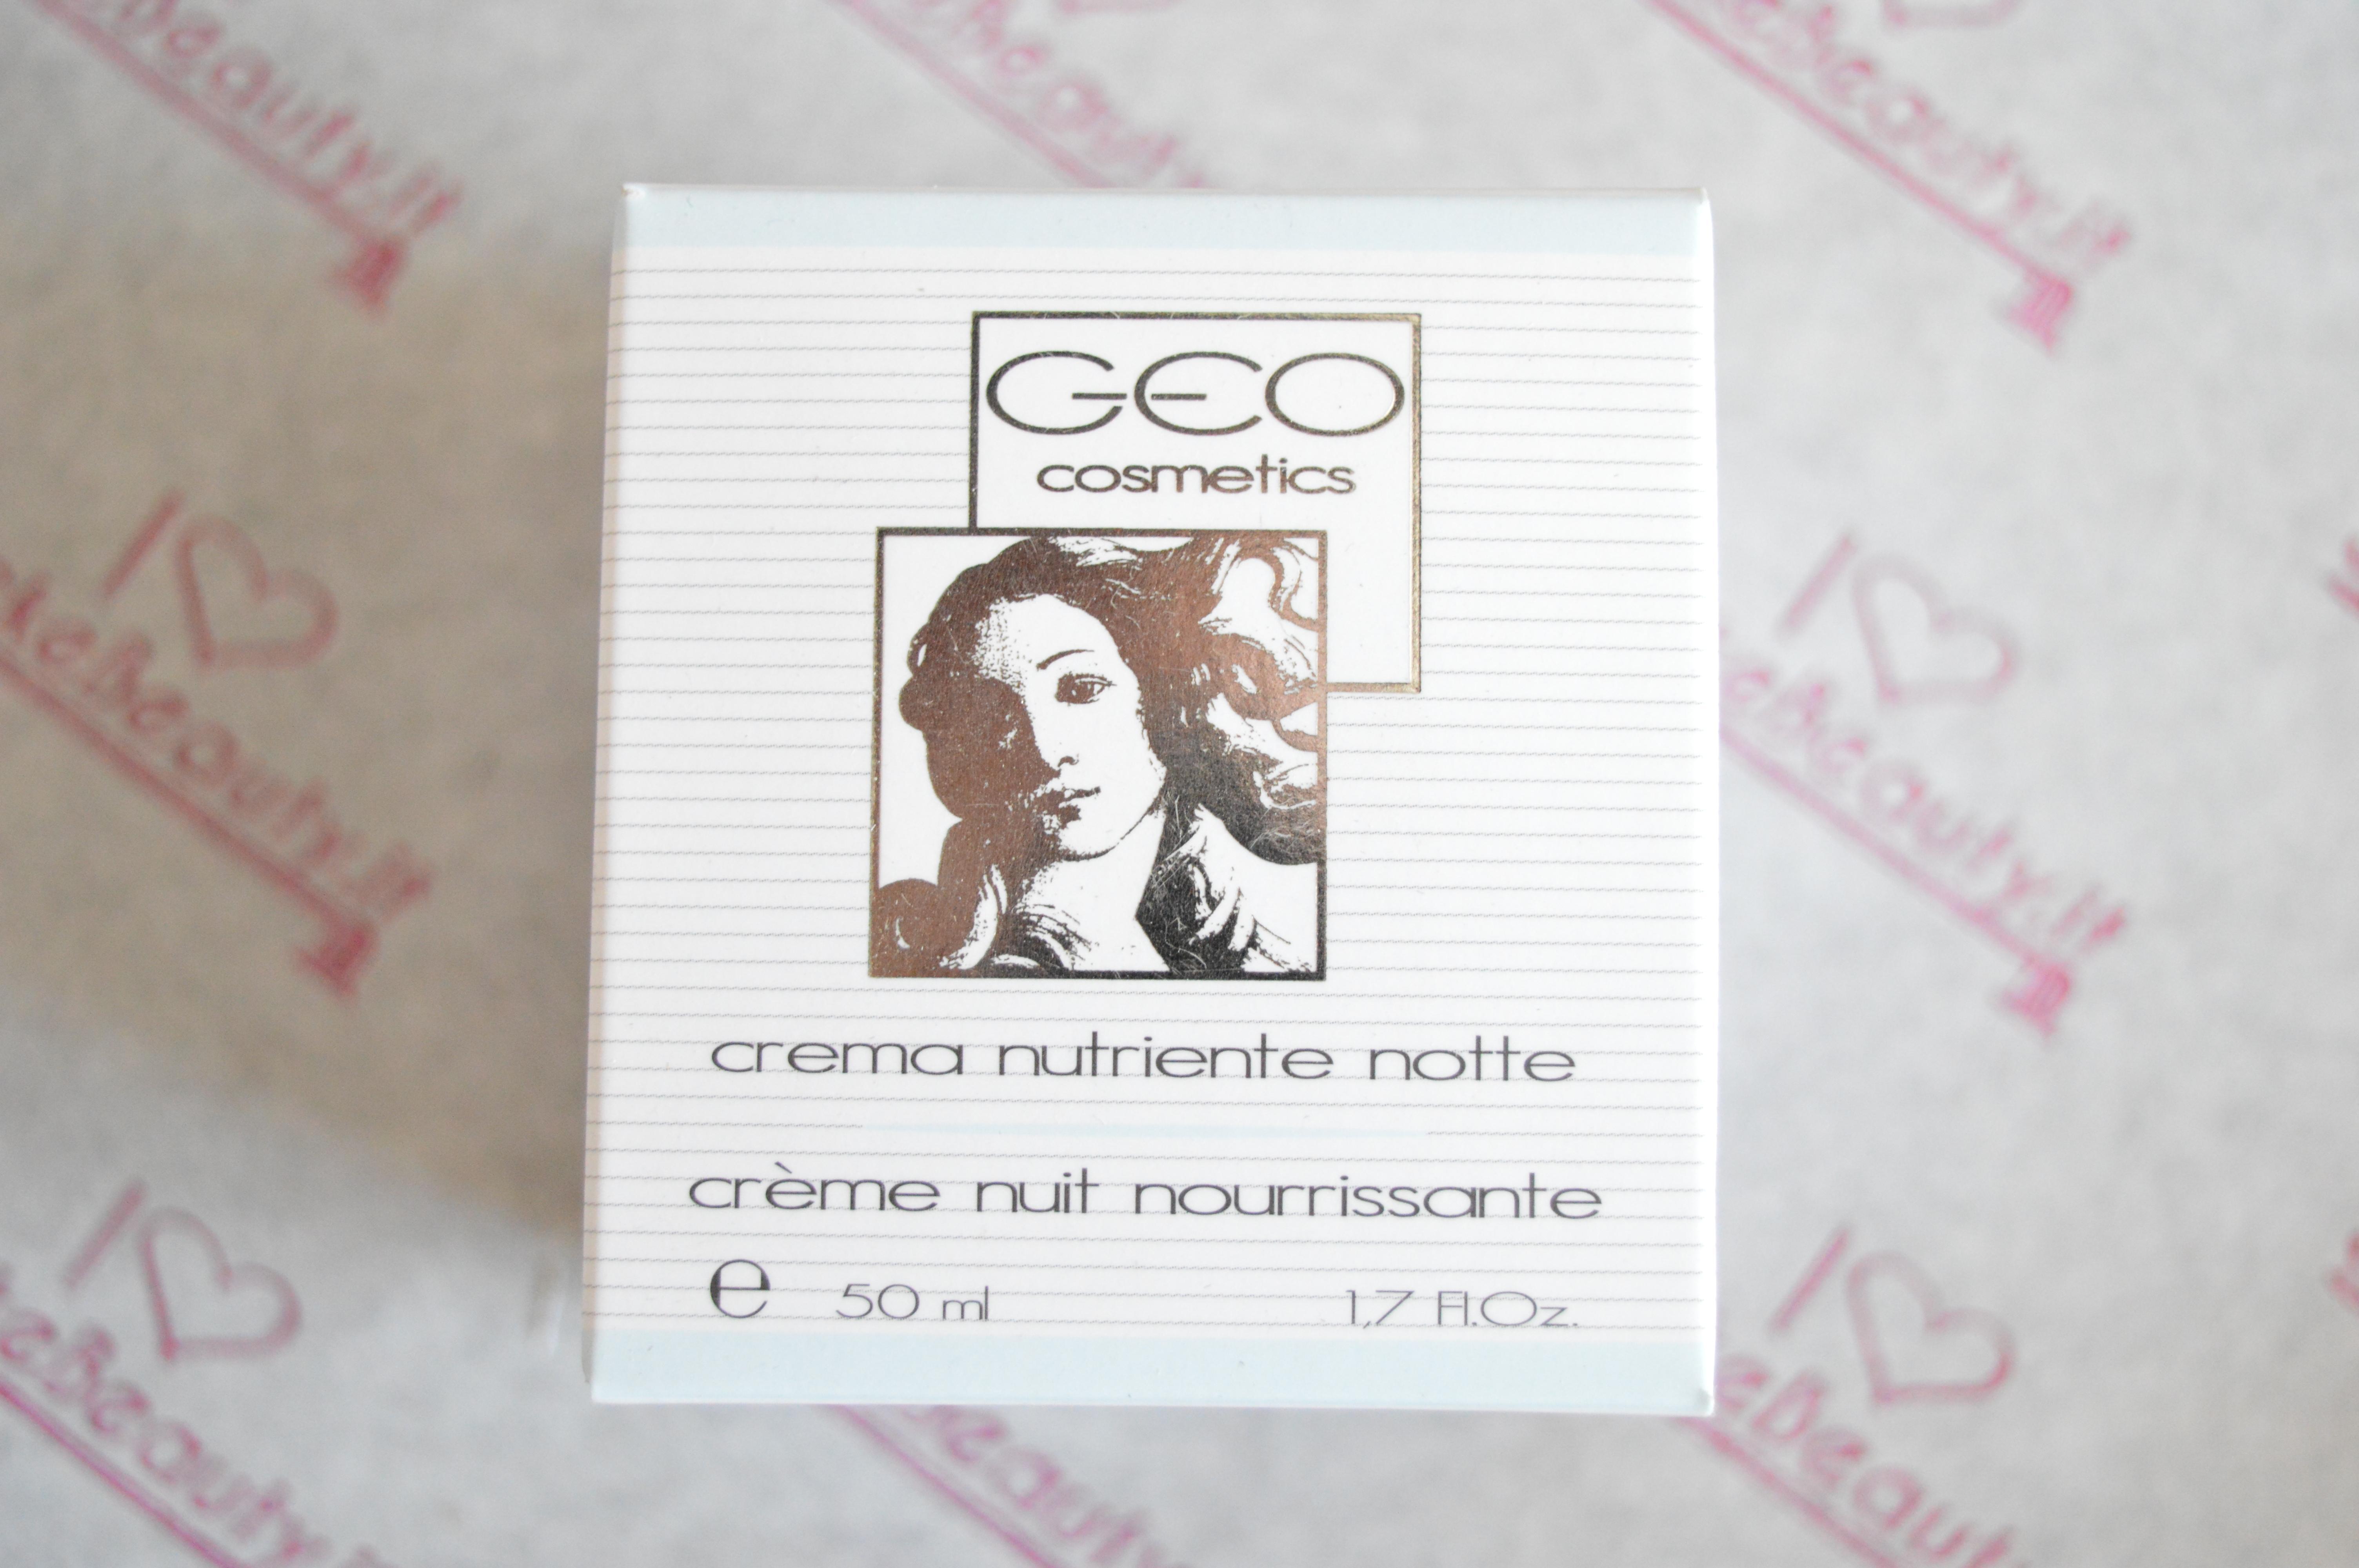 GEO COSMETICS- CREMA NUTRIENTE NOTTE